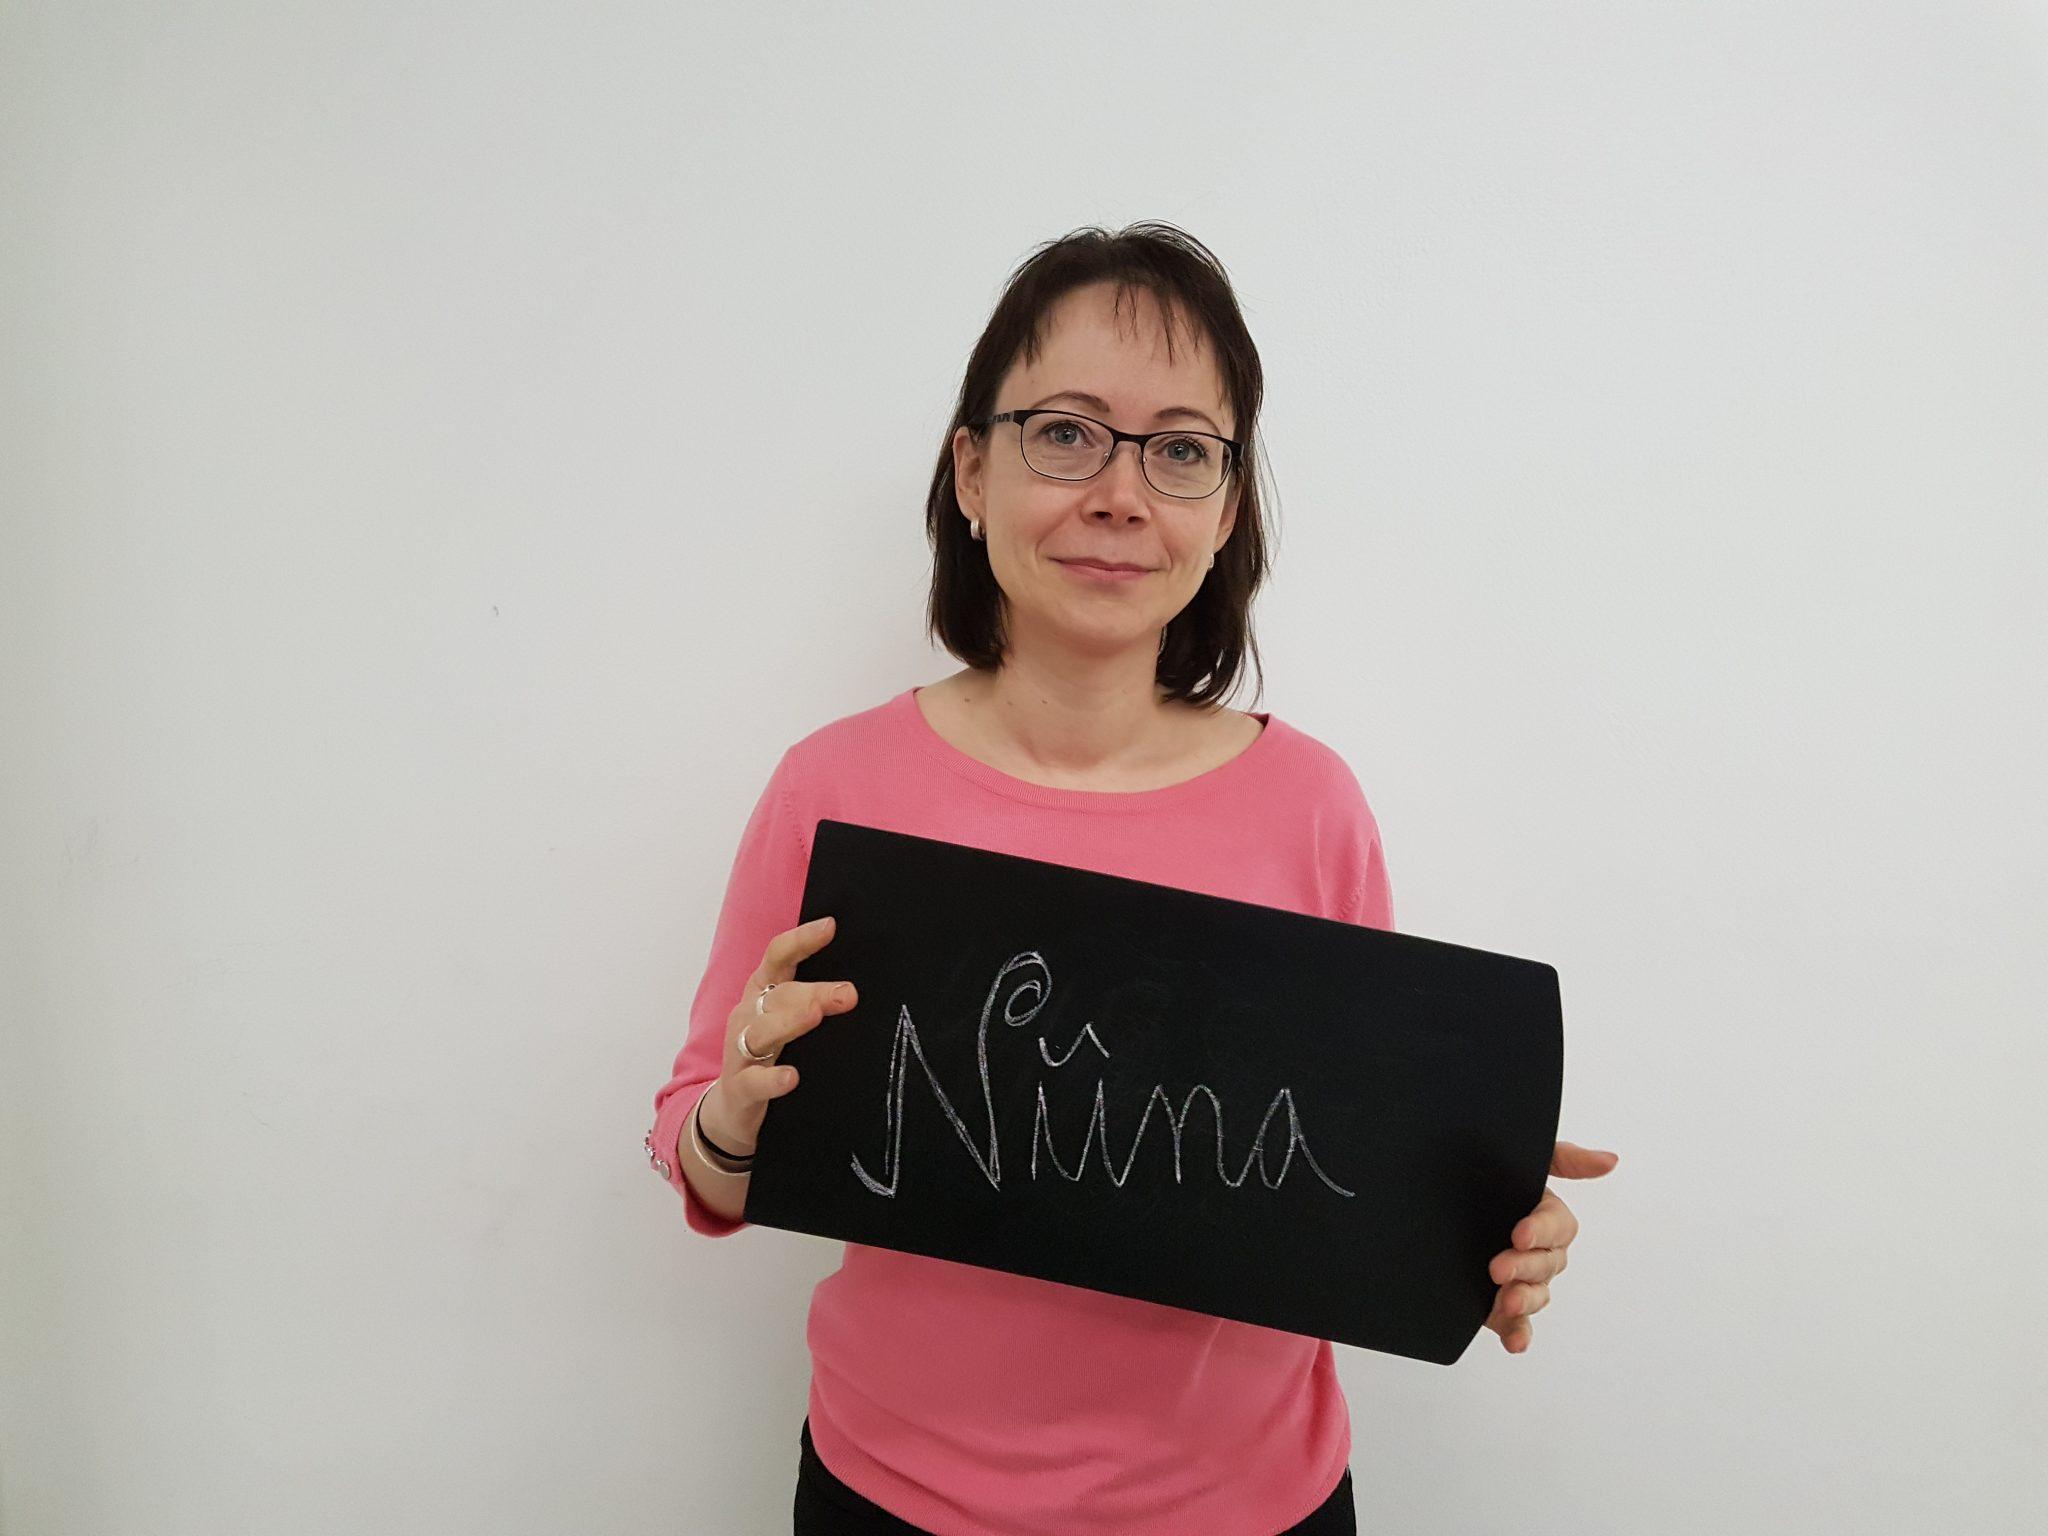 Niina Kupiainen